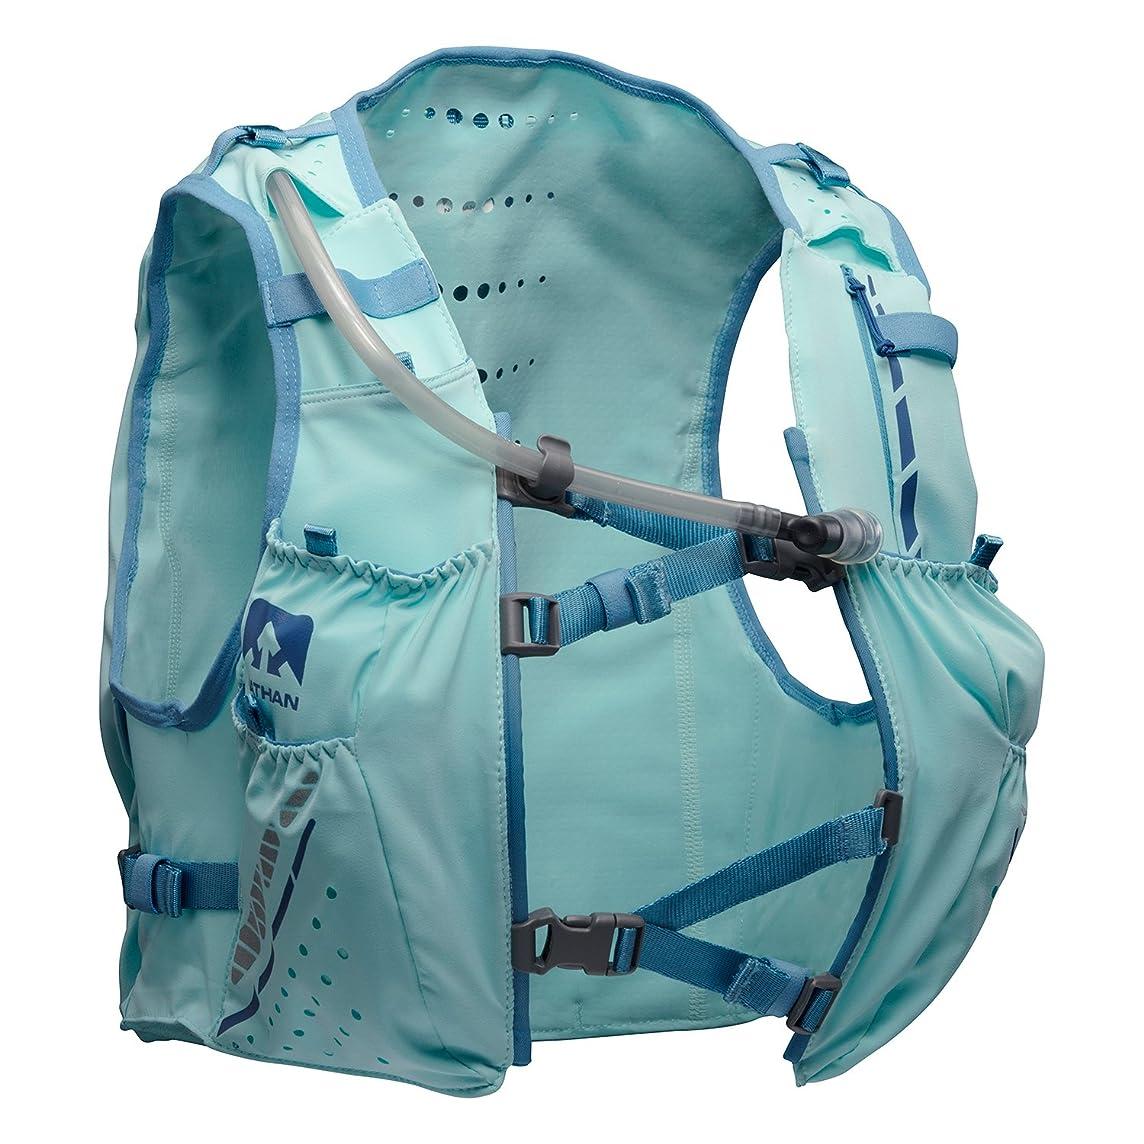 Nathan Vaporhowe Hydration Pack, Running Vest with 1.8L Hydration Bladder Reservoir, Women's